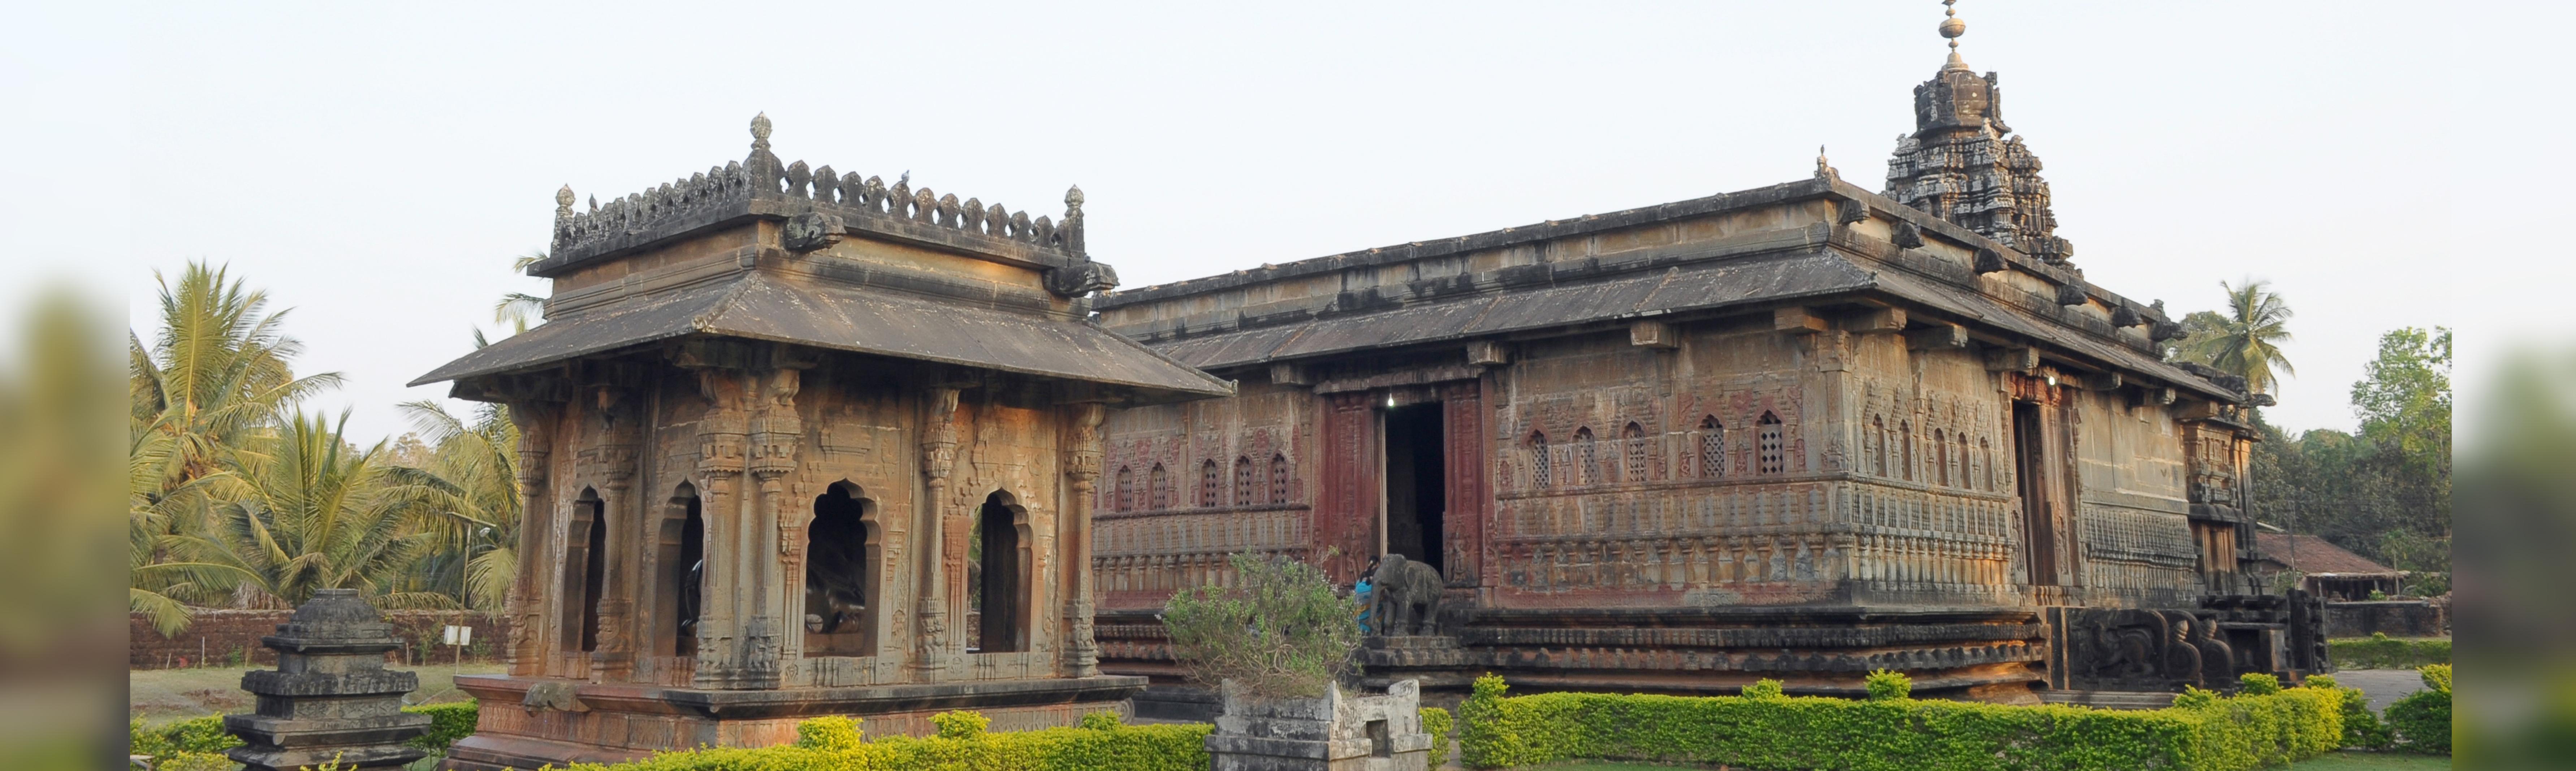 ikkeri temple